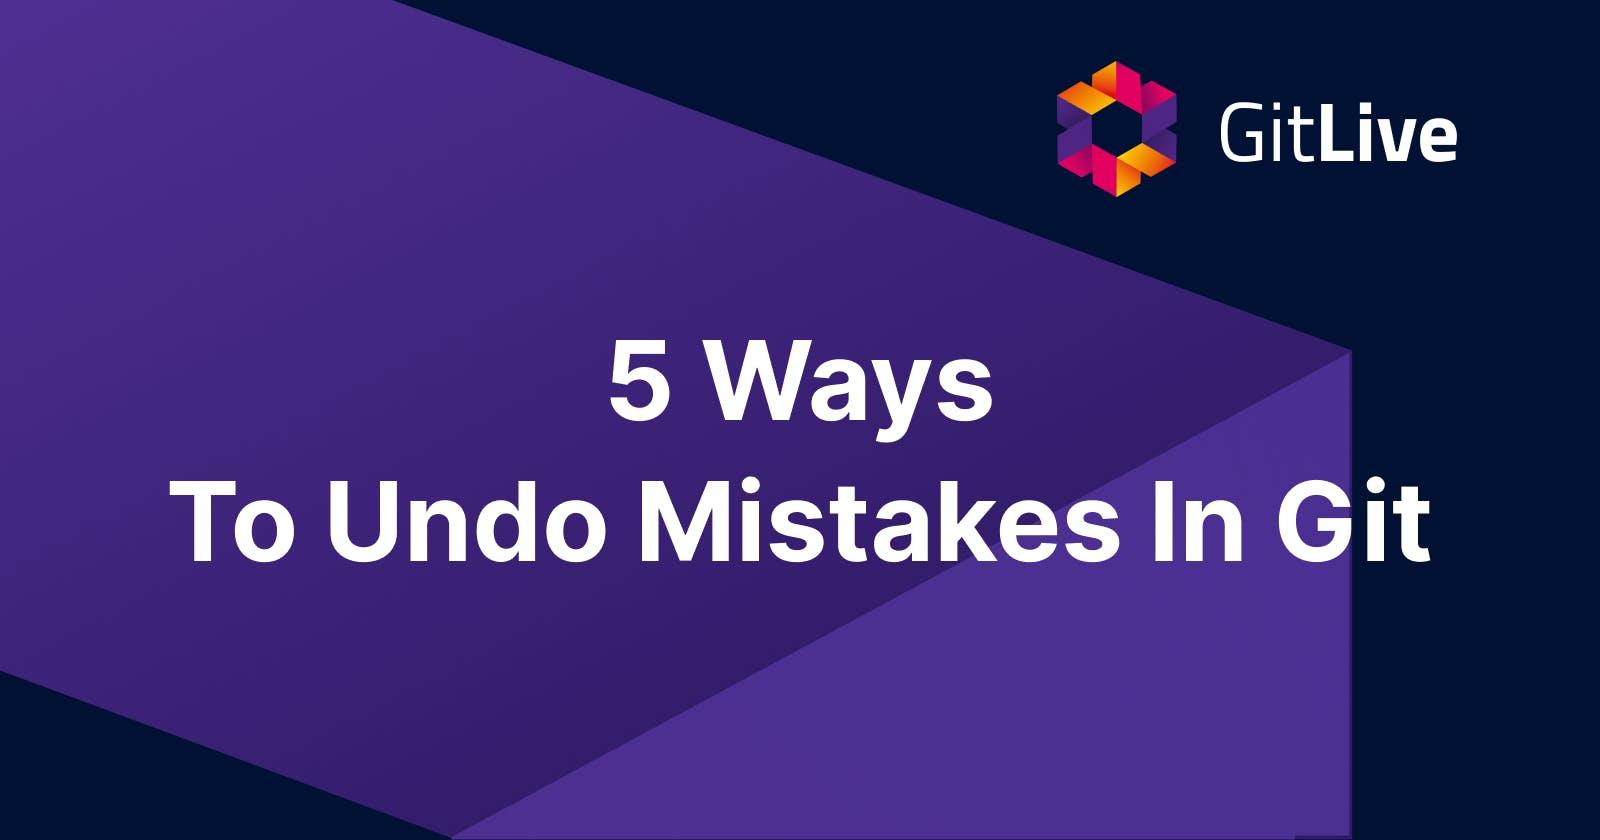 5 Ways To Undo Mistakes In Git